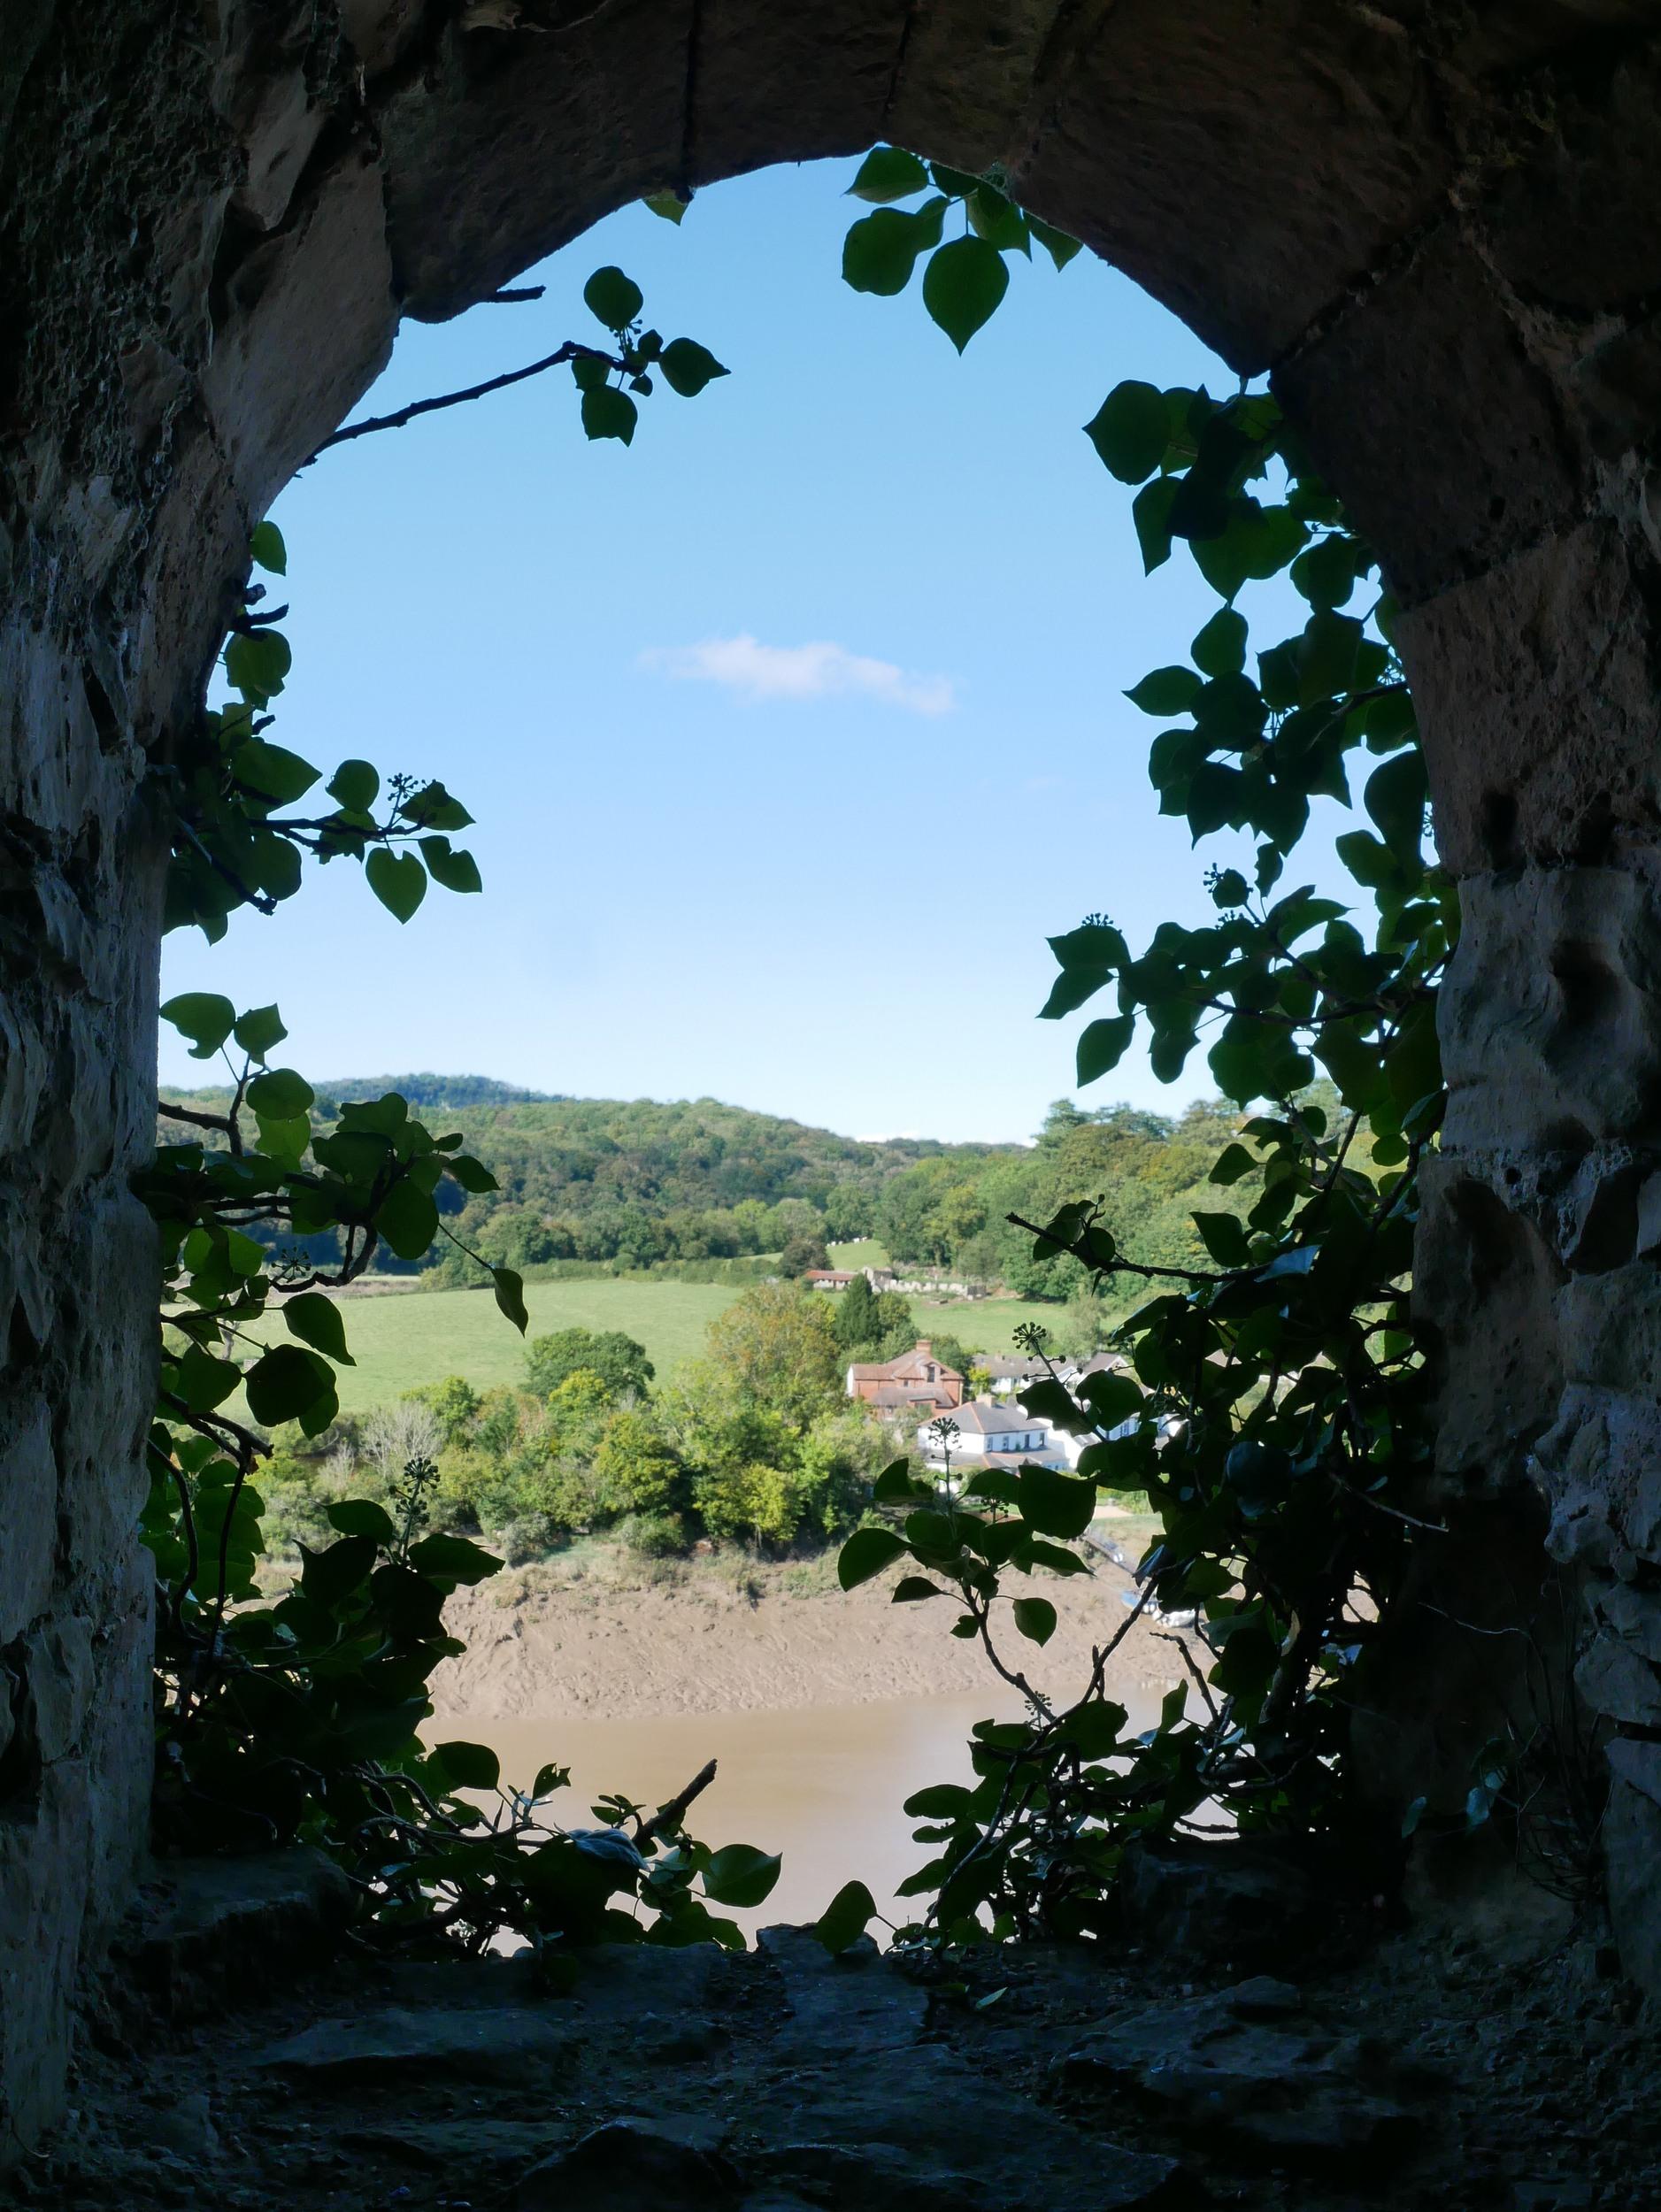 Chepstow Castle, Wye Valley Photo Heatheronhertravels.com